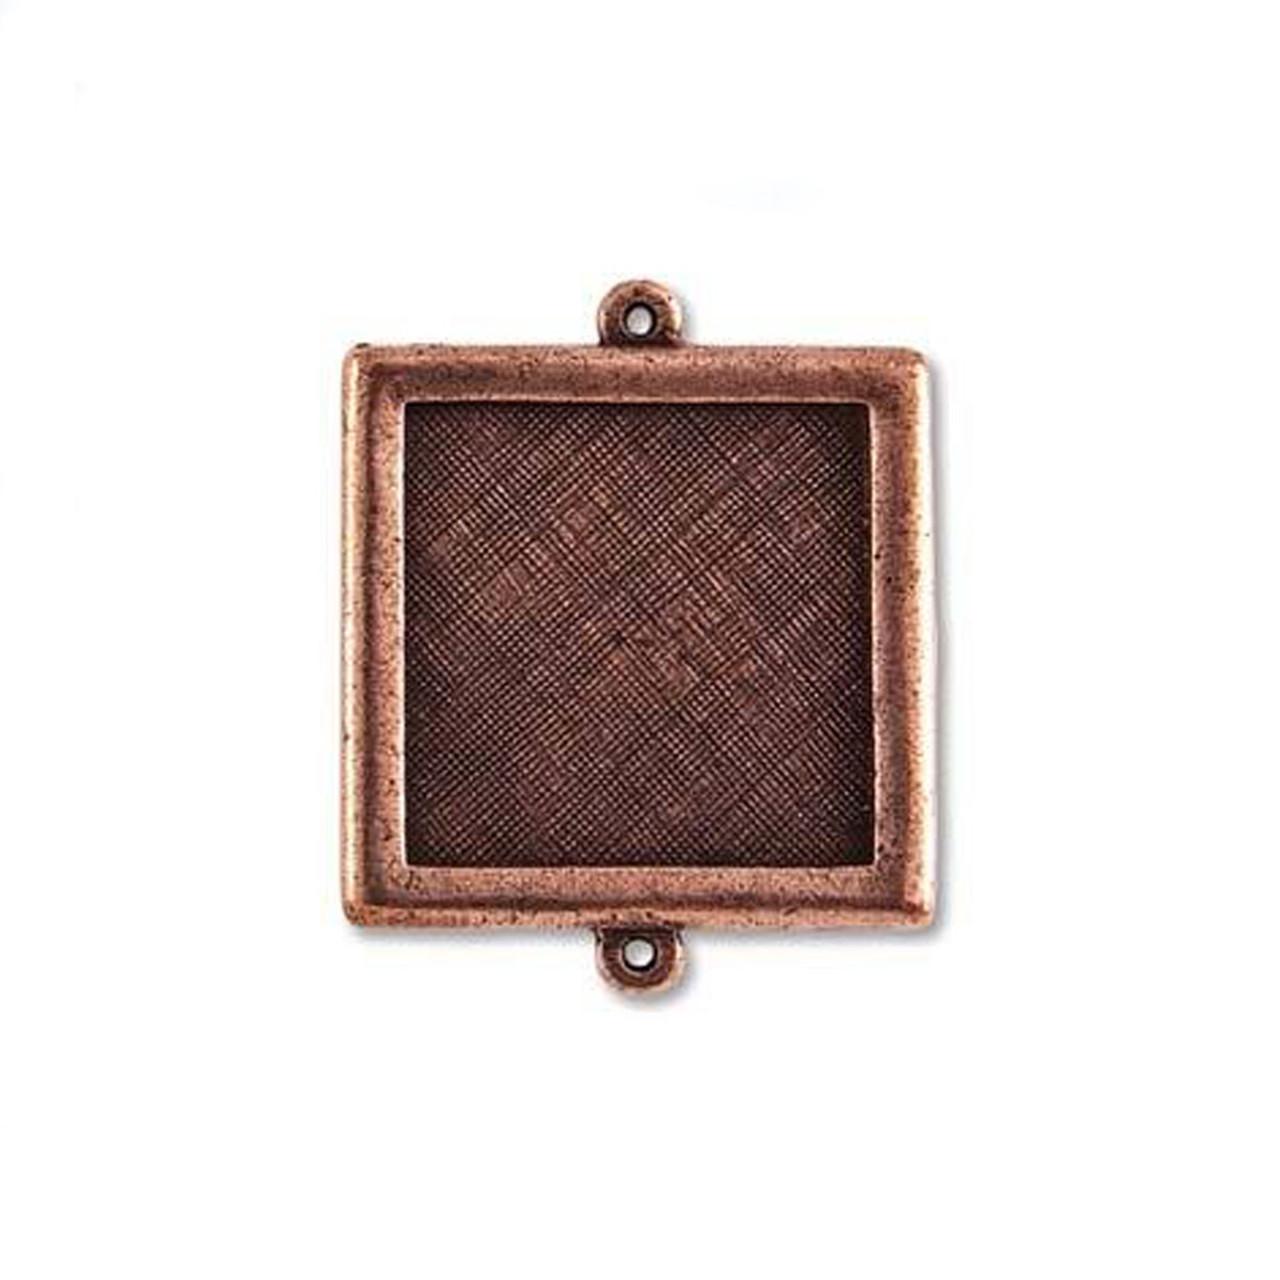 Square Link Bezel - Antique Copper - 30mm